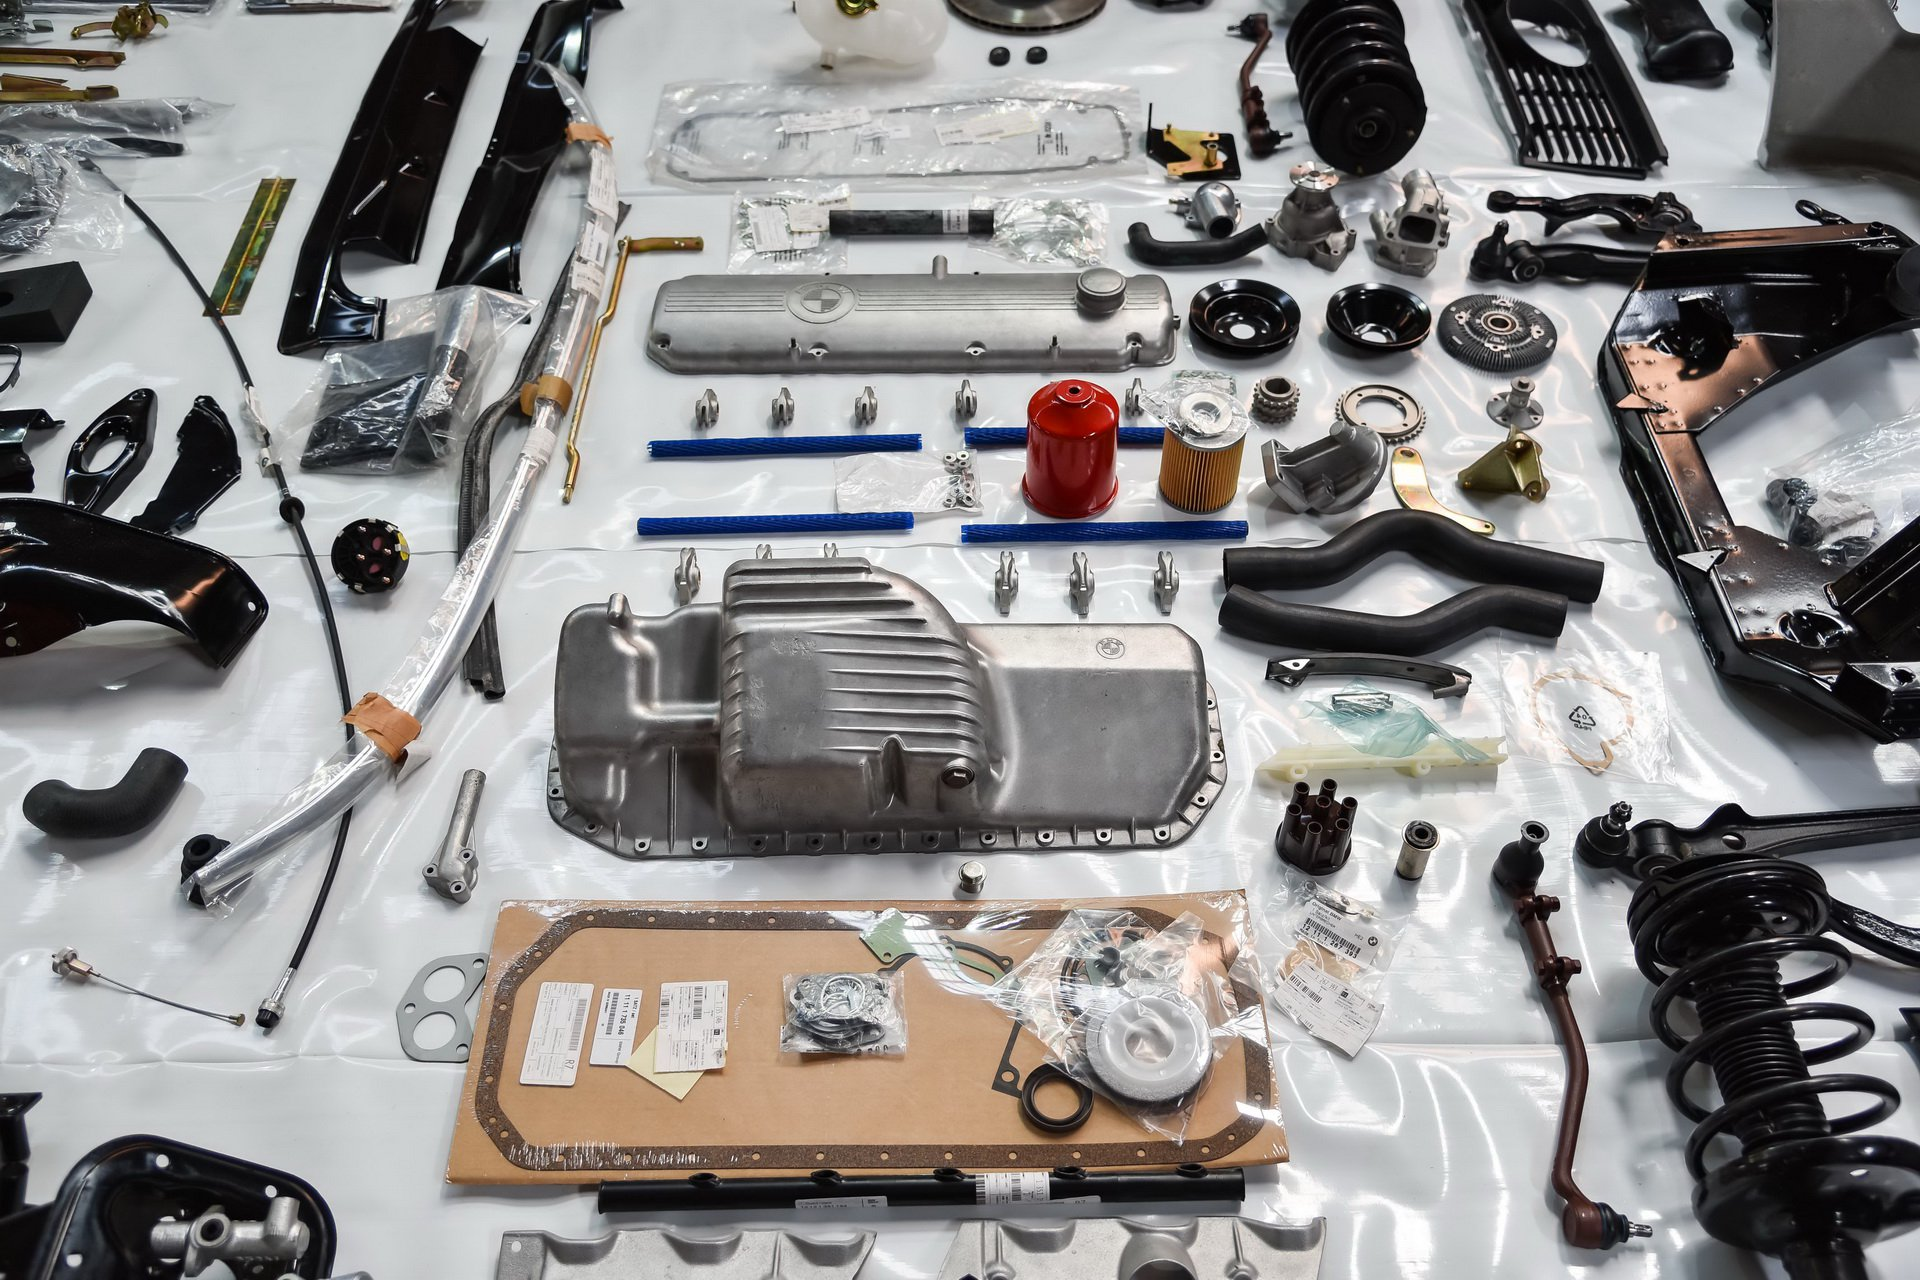 BMW-530-MLE-Restoration-process-140